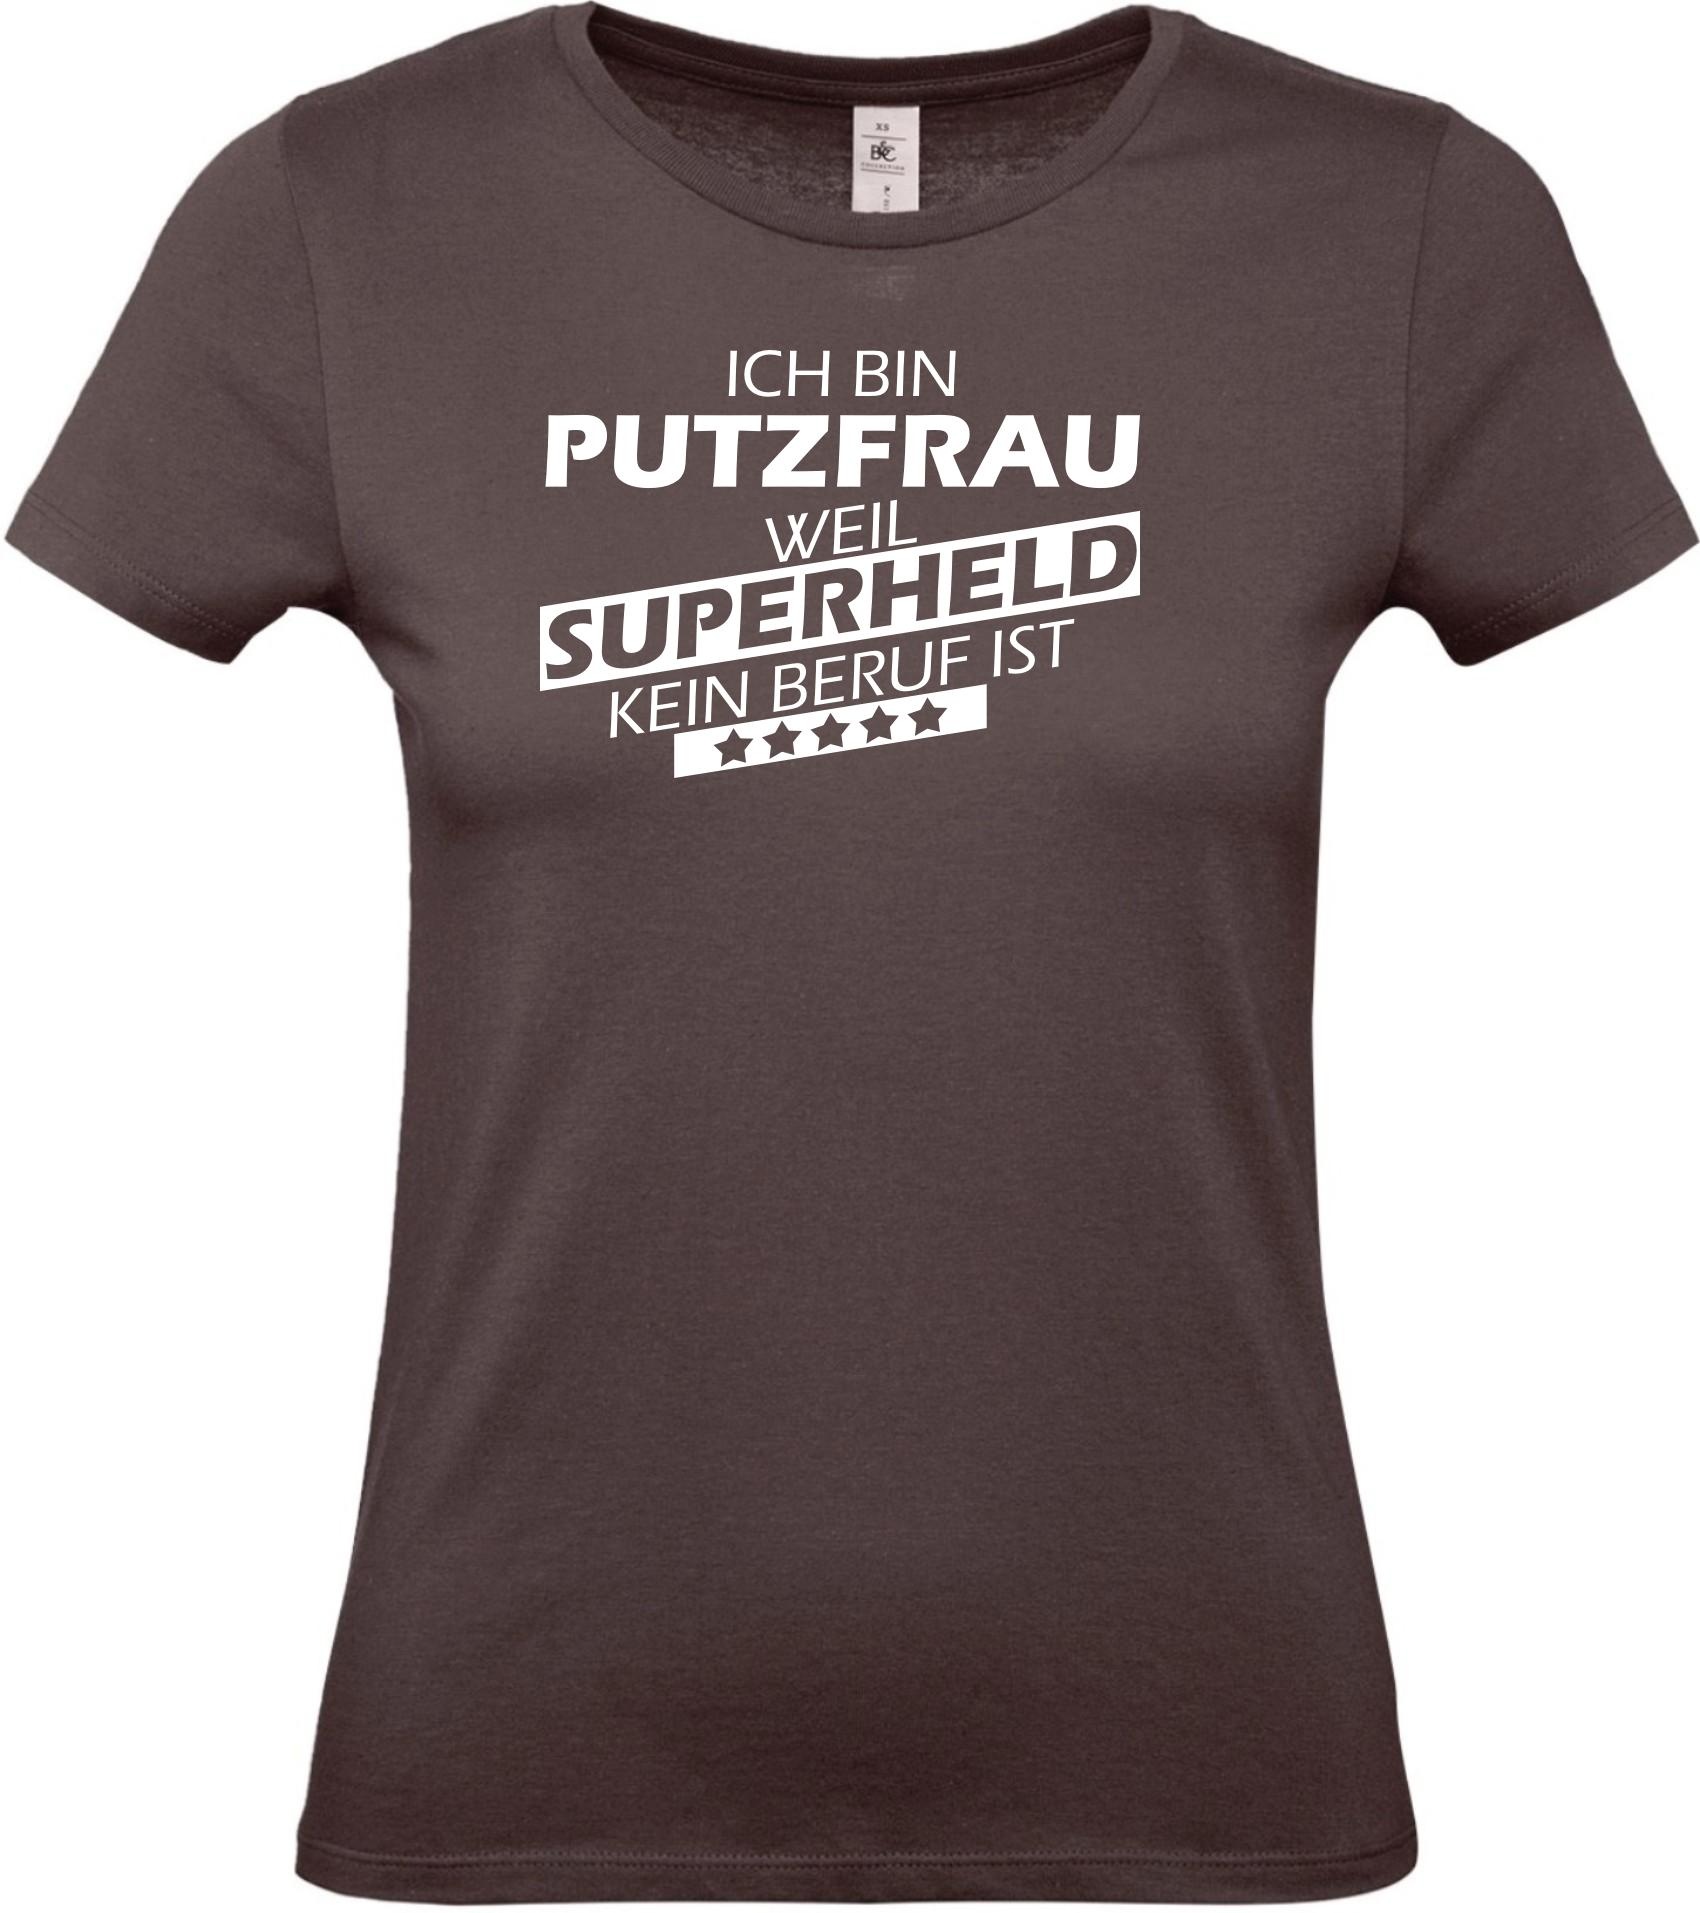 Lady-T-Shirt-Ich-bin-Putzfrau-weil-Superheld-kein-Beruf-ist